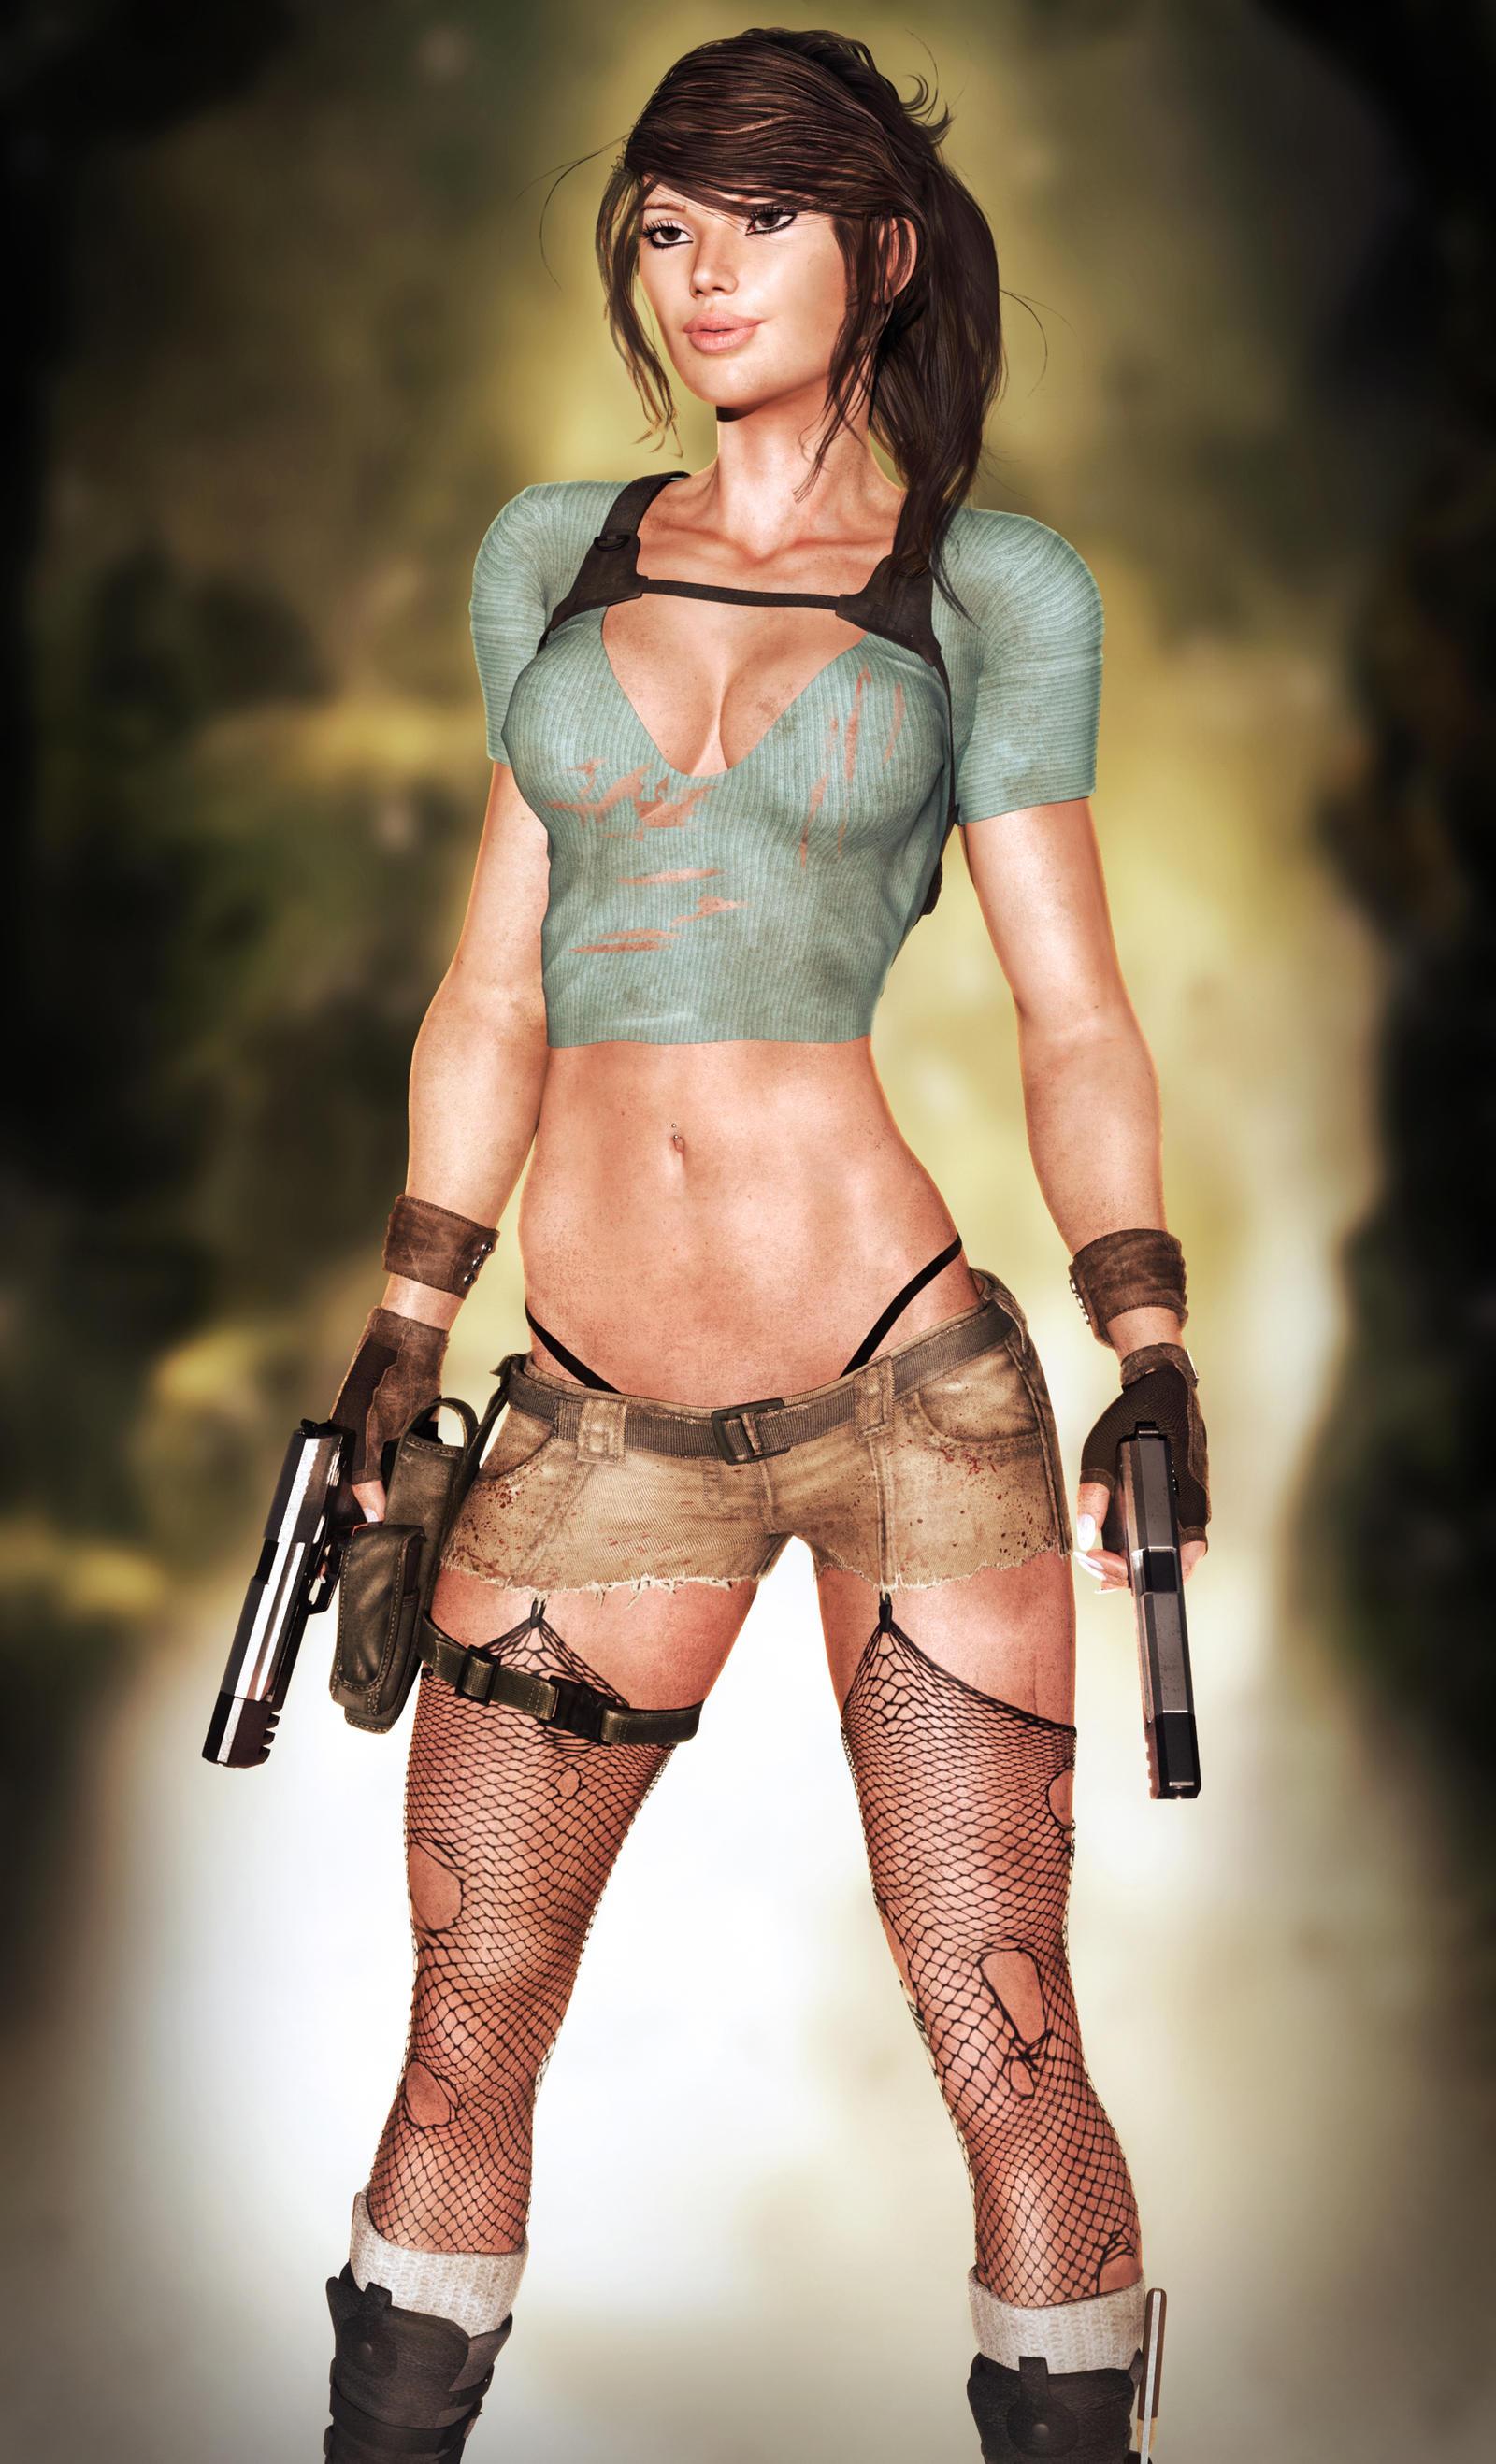 Lara Croft by darvarq on DeviantArt